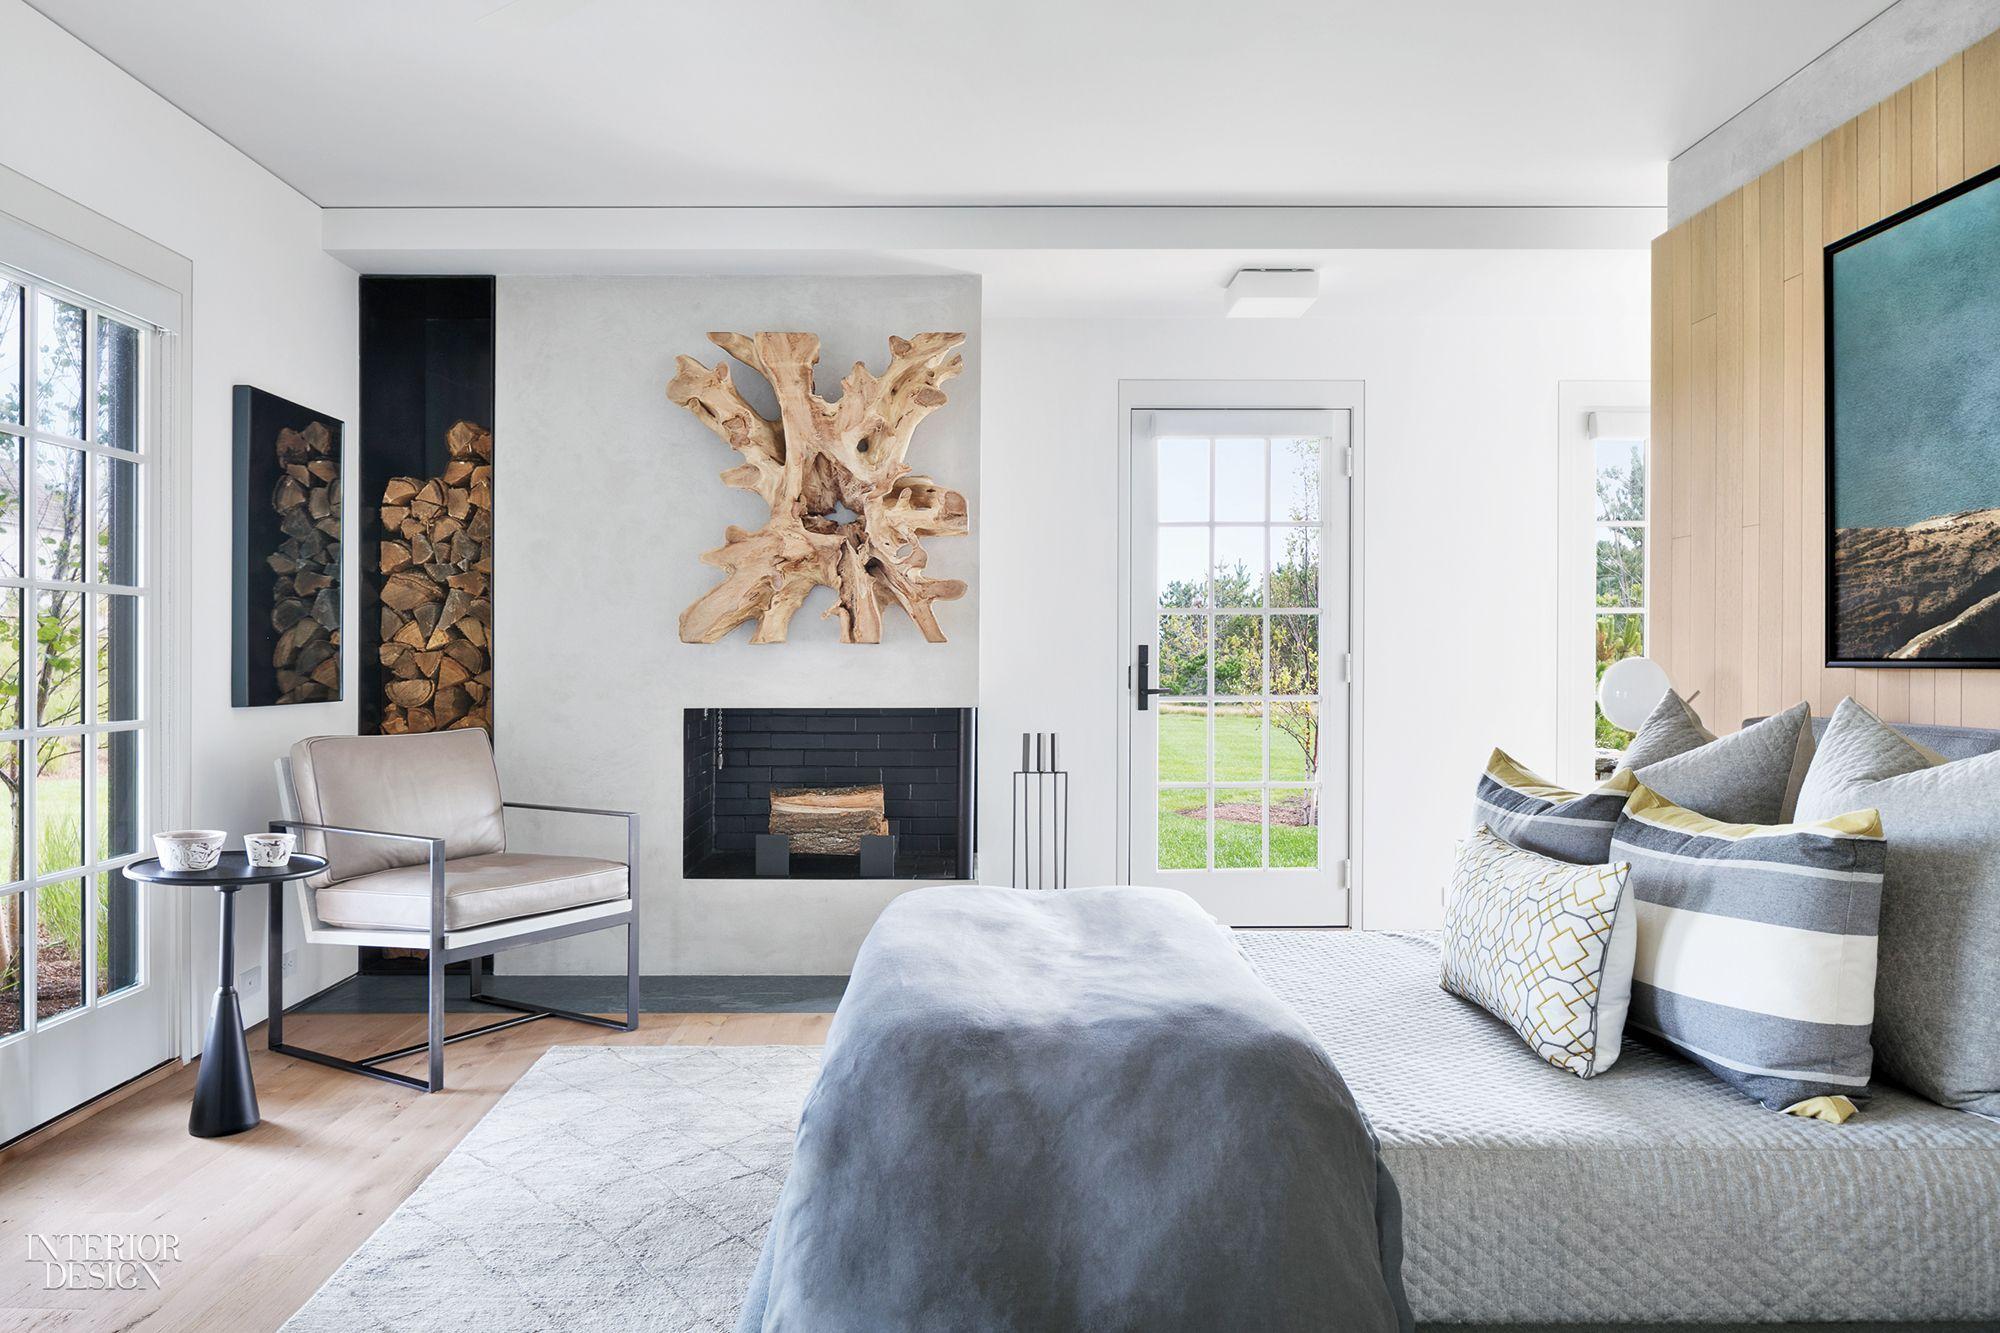 Master bedroom 2018 trends  Latest Bedroom Designs  May   Bedroom Design Ideas